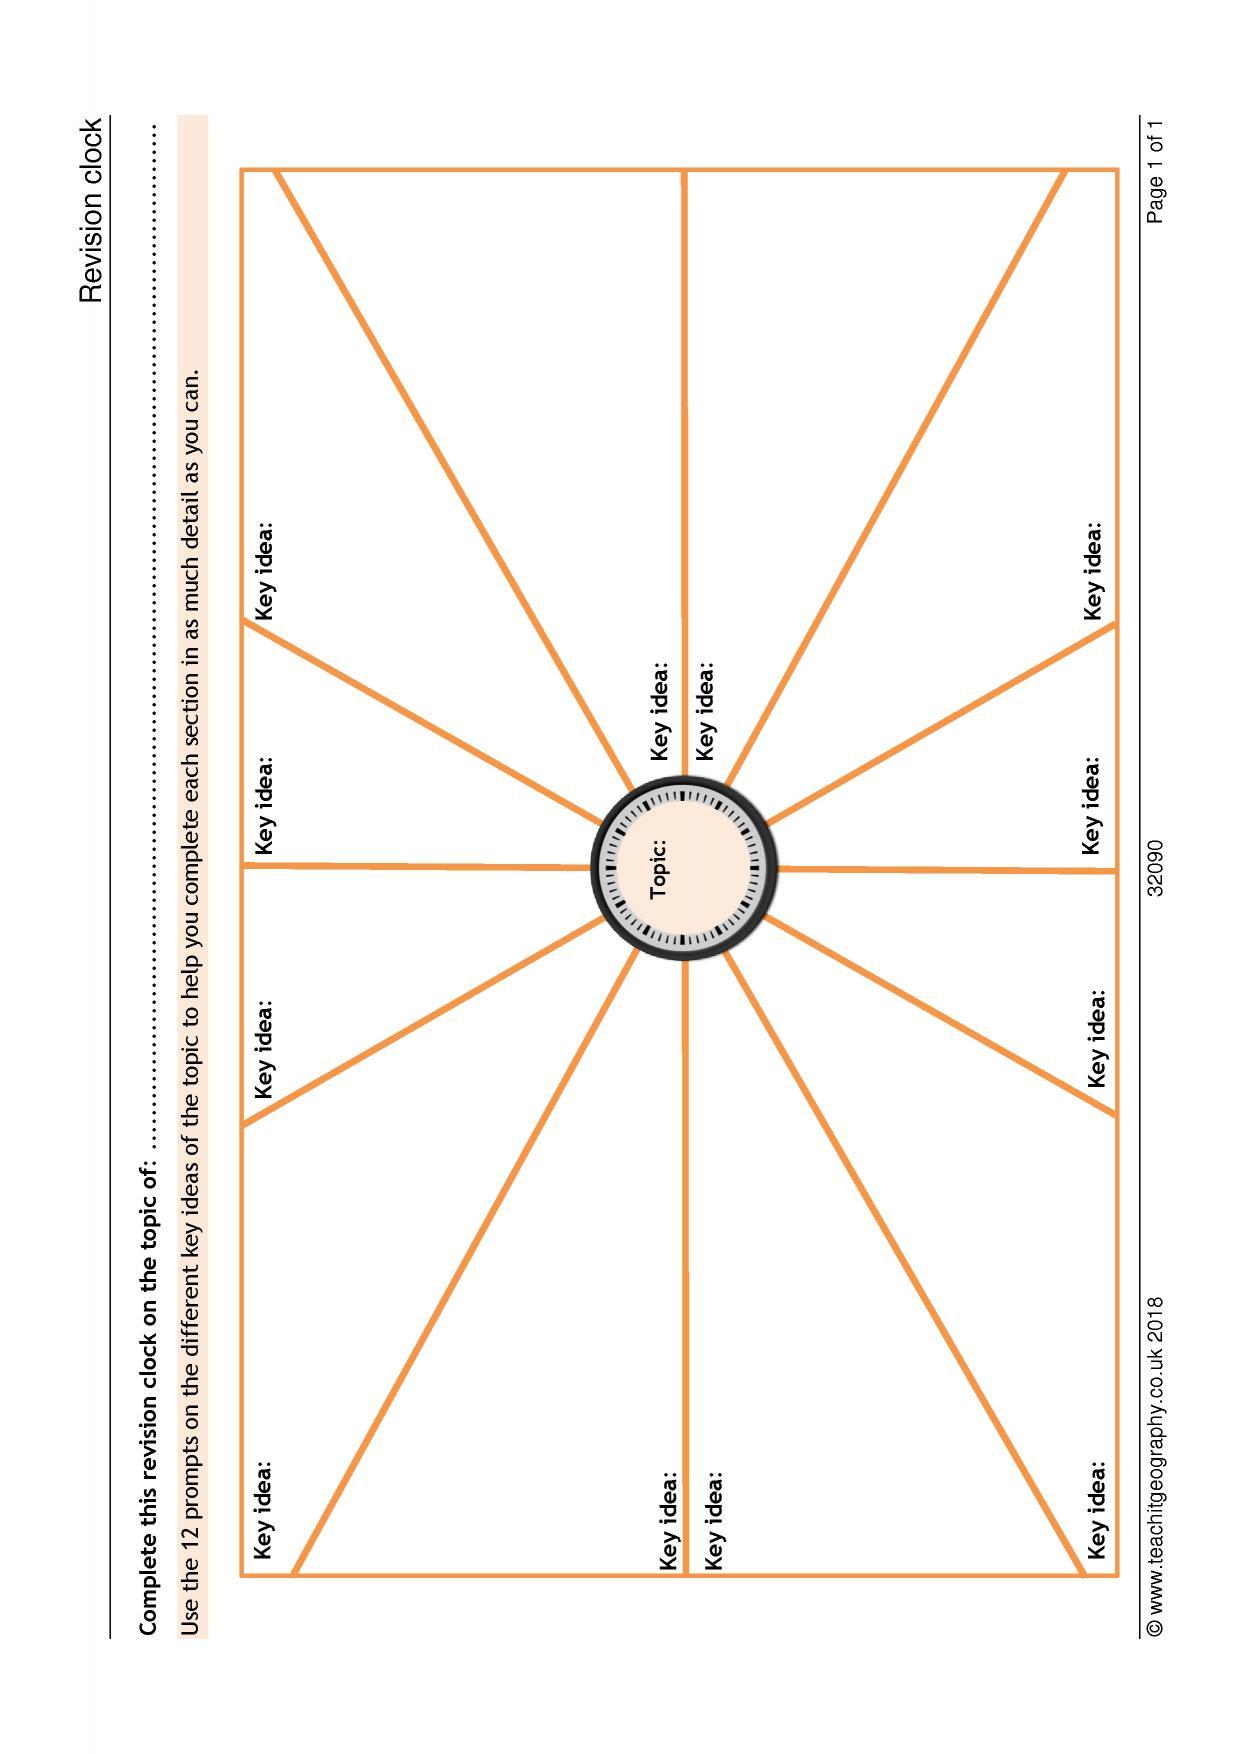 Teaching templates - Teachit Geography